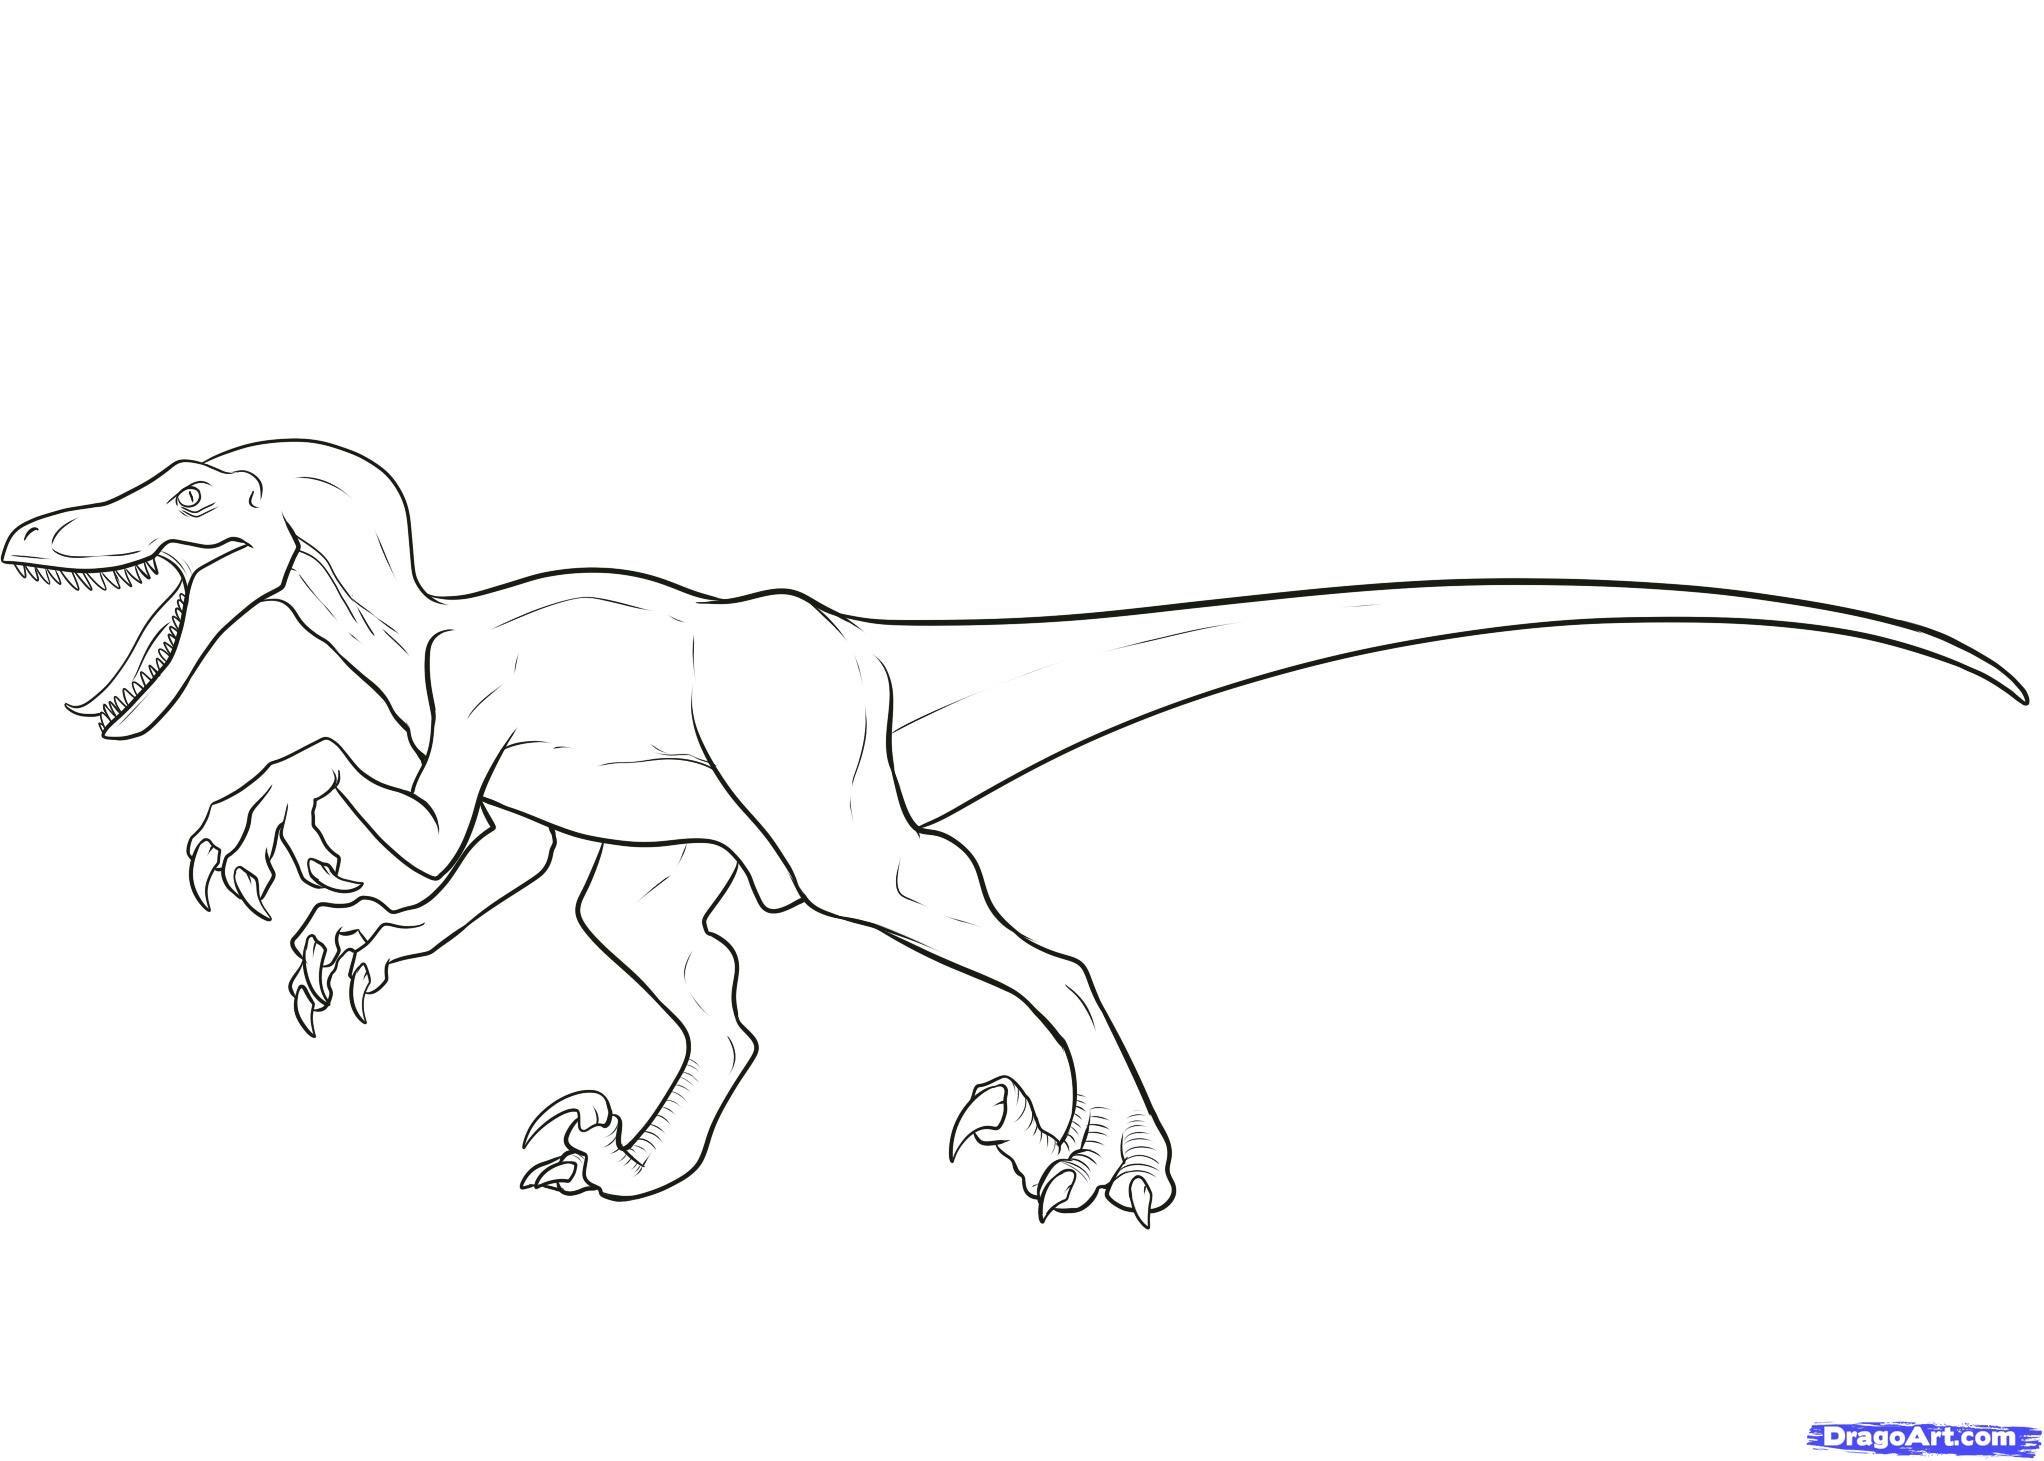 How To Draw A Velociraptor Velociraptor Step By Step Dinosaurs